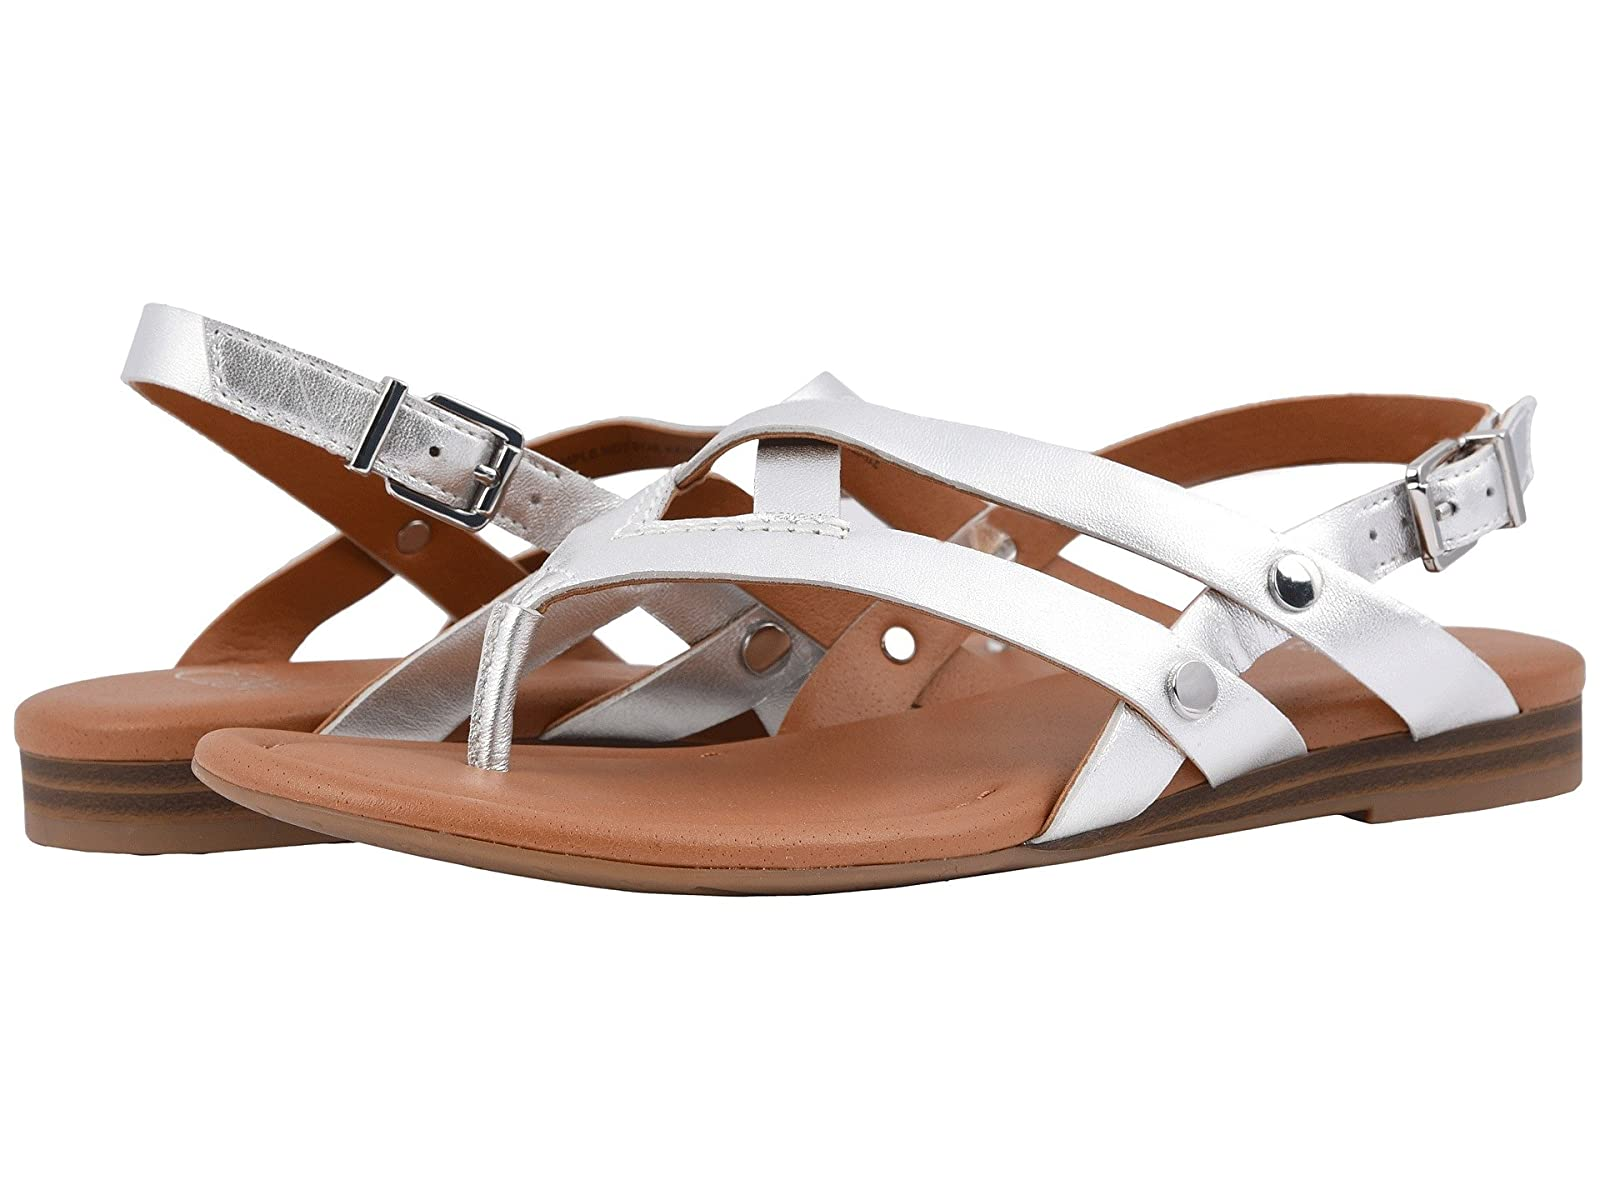 Franco Sarto GretchenAtmospheric grades have affordable shoes